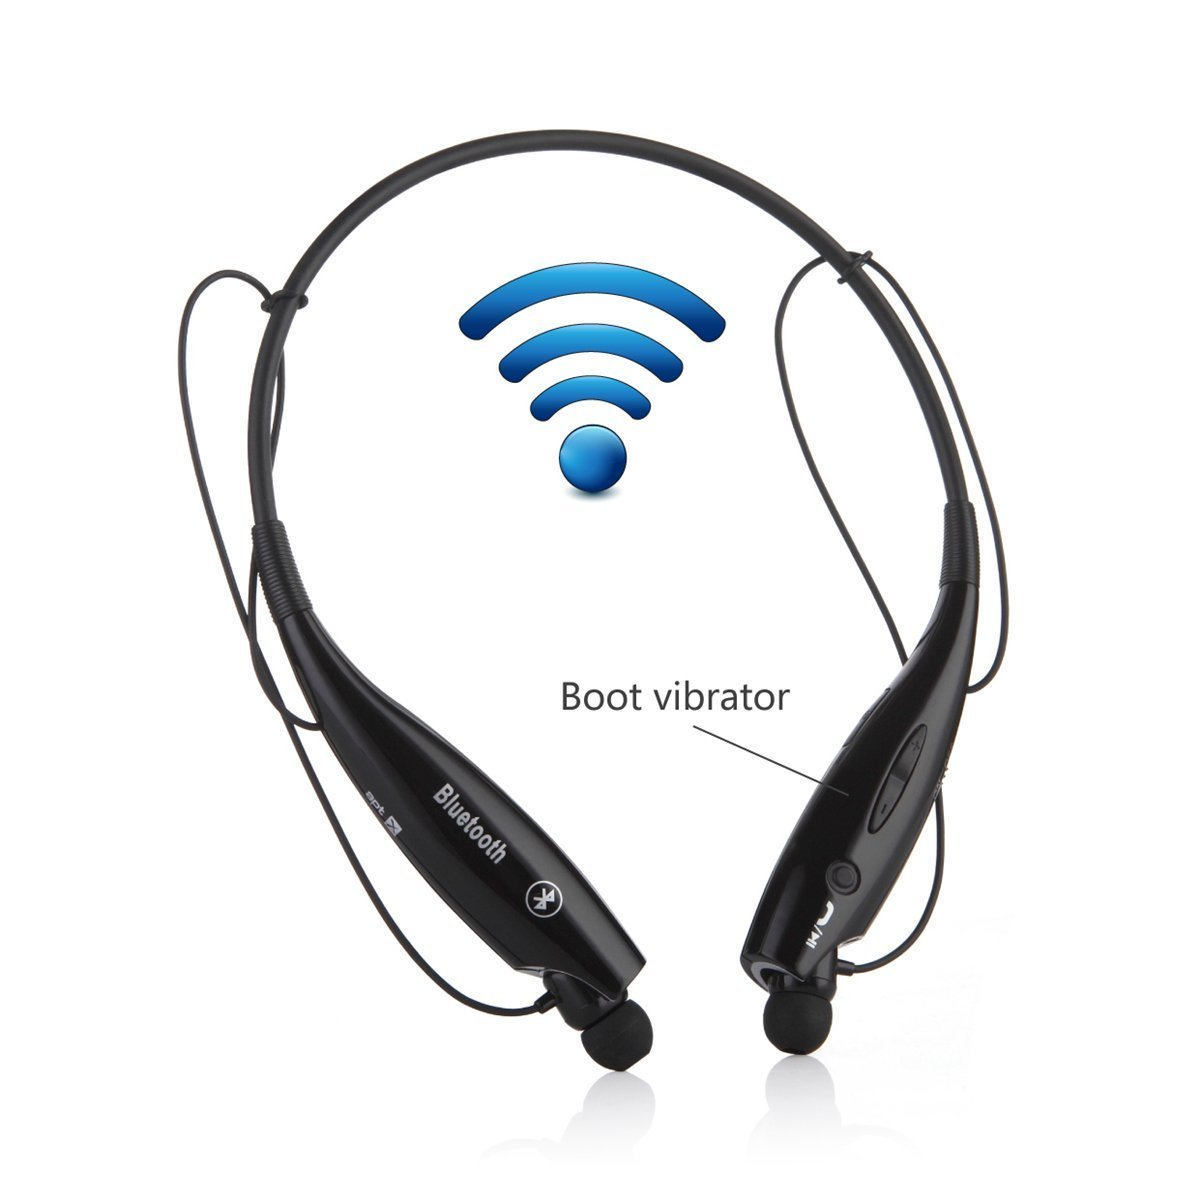 6e4c85e9491 Get Quotations · Wireless Bluetooth Music Stereo Universal Headset  Headphone Bluetooth Headset Universal Vibration Neckband Style Headset  Earphone Headphone